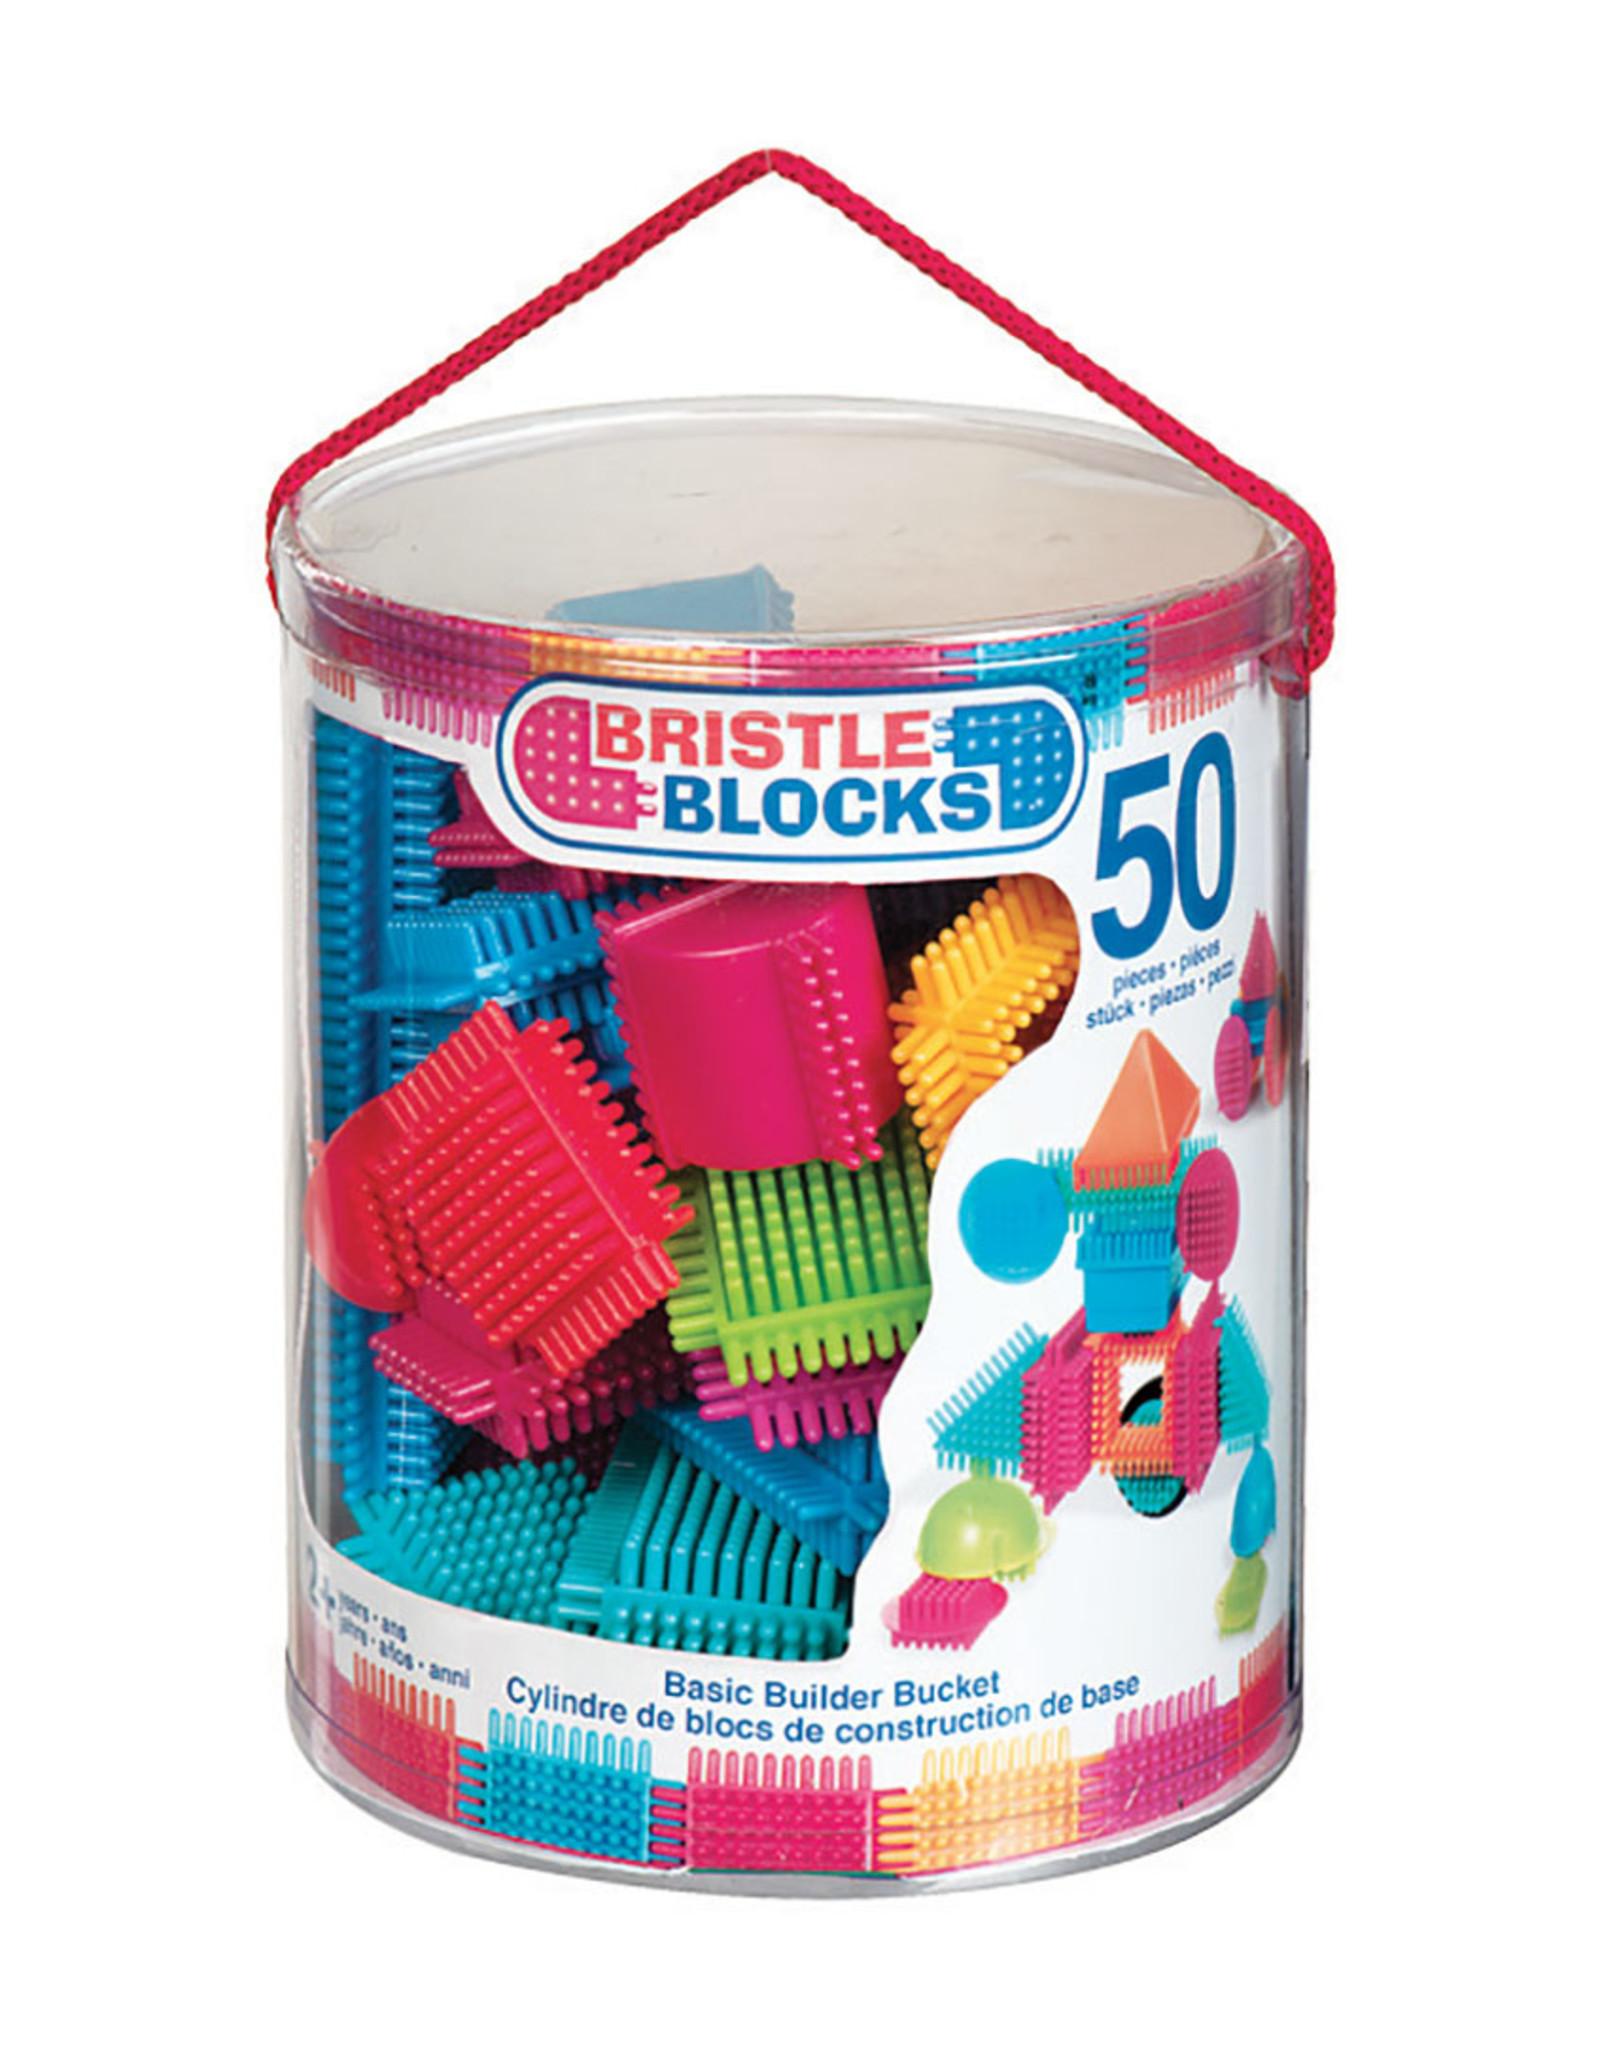 Battat Bristle Blocks 50pc